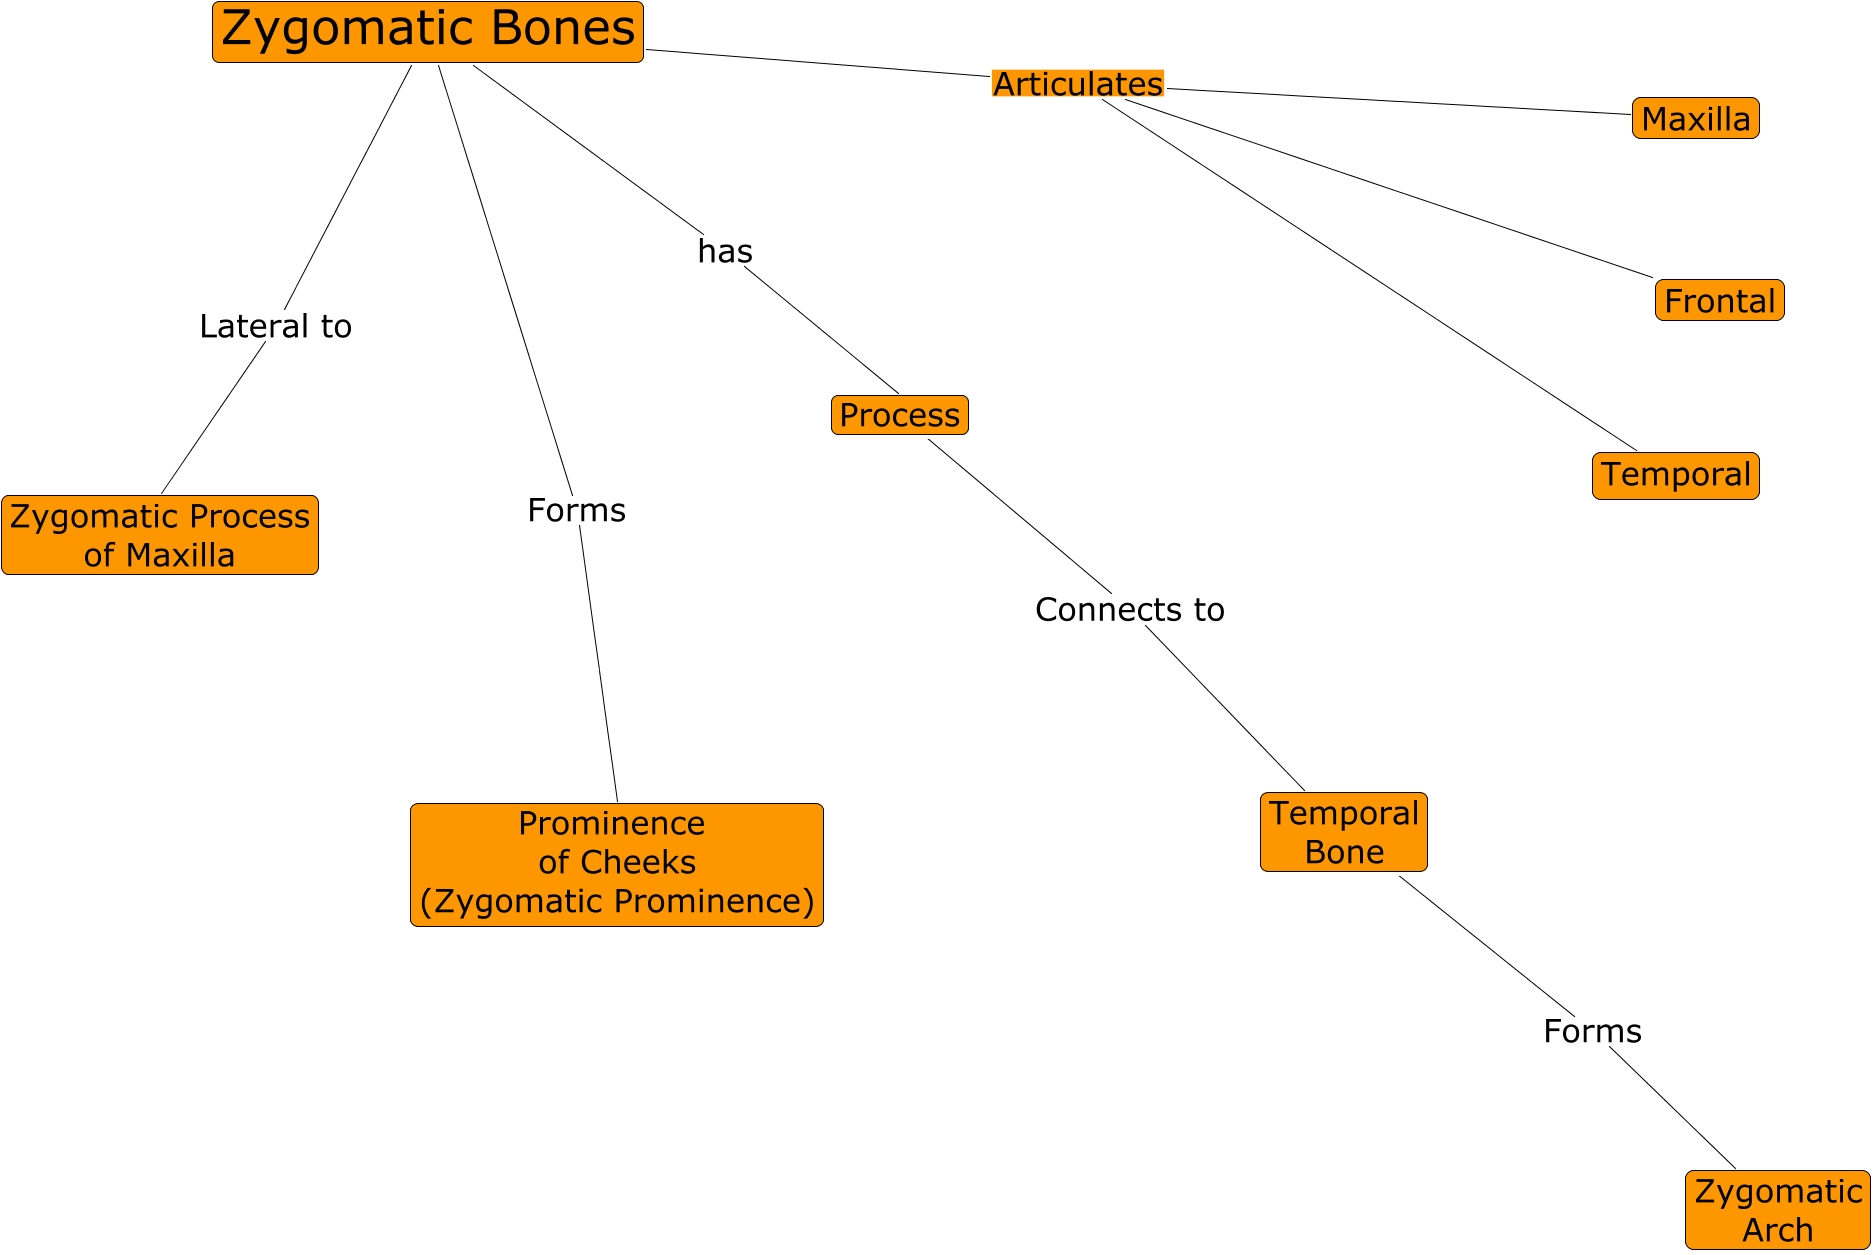 Anatomy - Zygomatic Bones